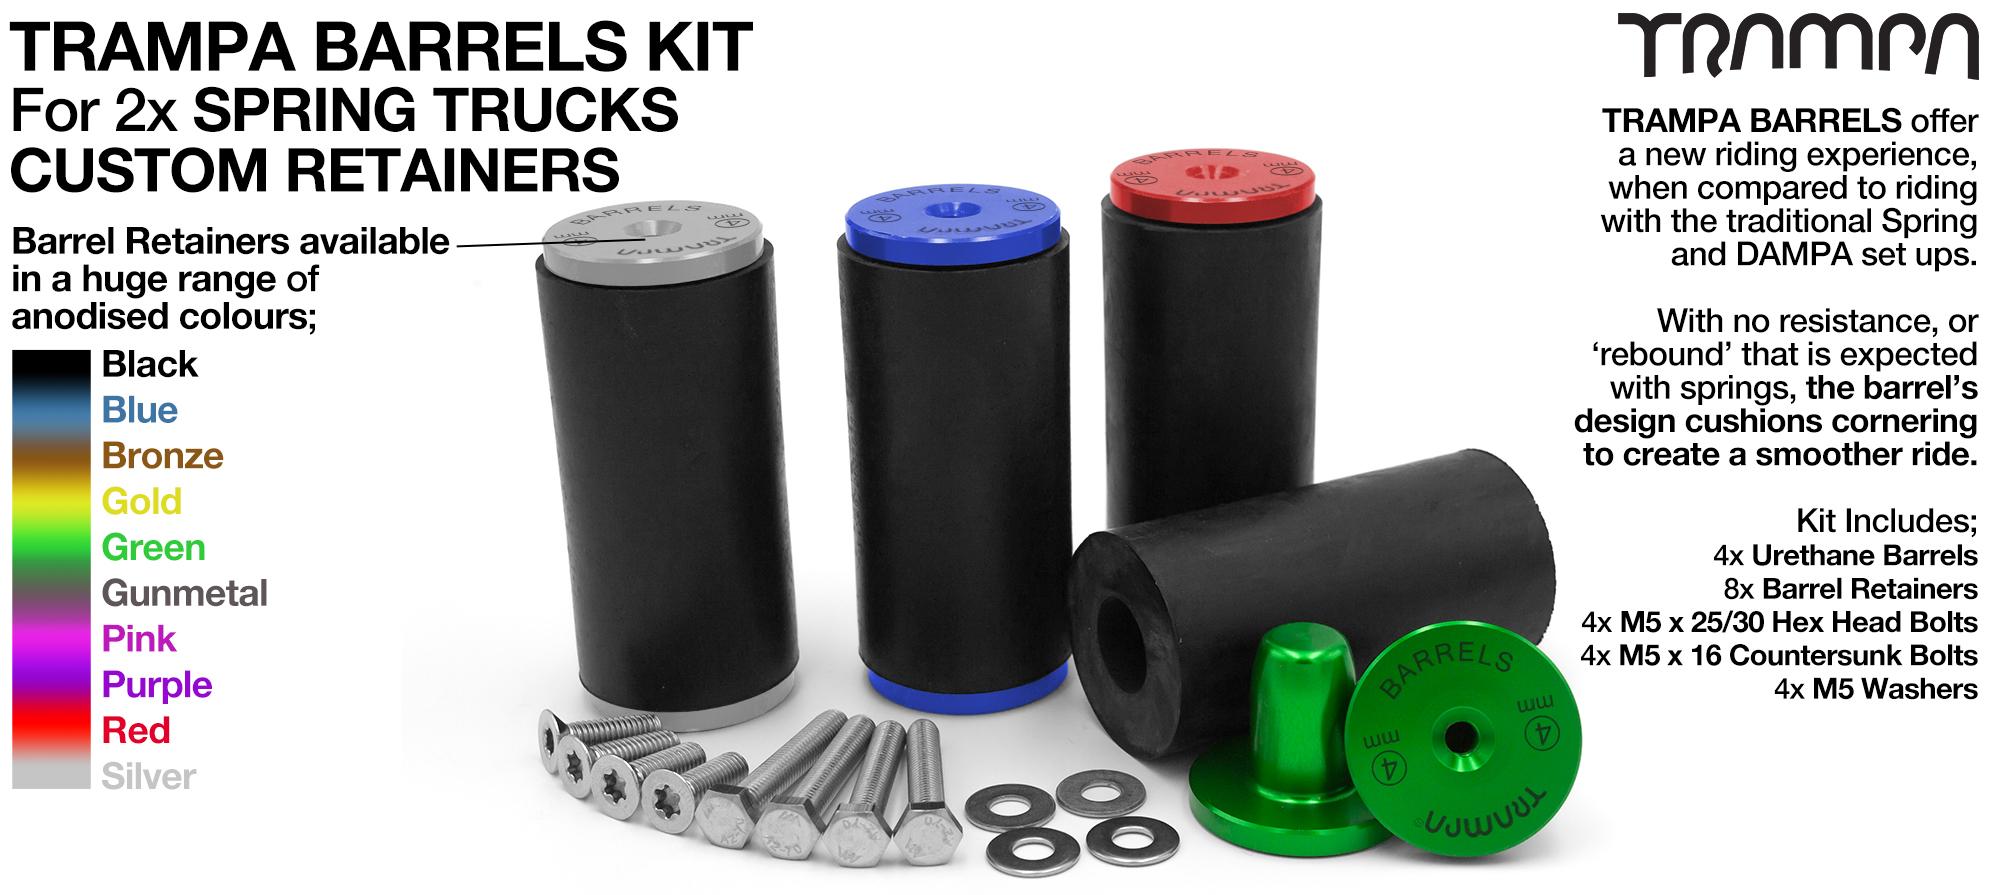 TRAMPA BARRELS Complete DECK Kit